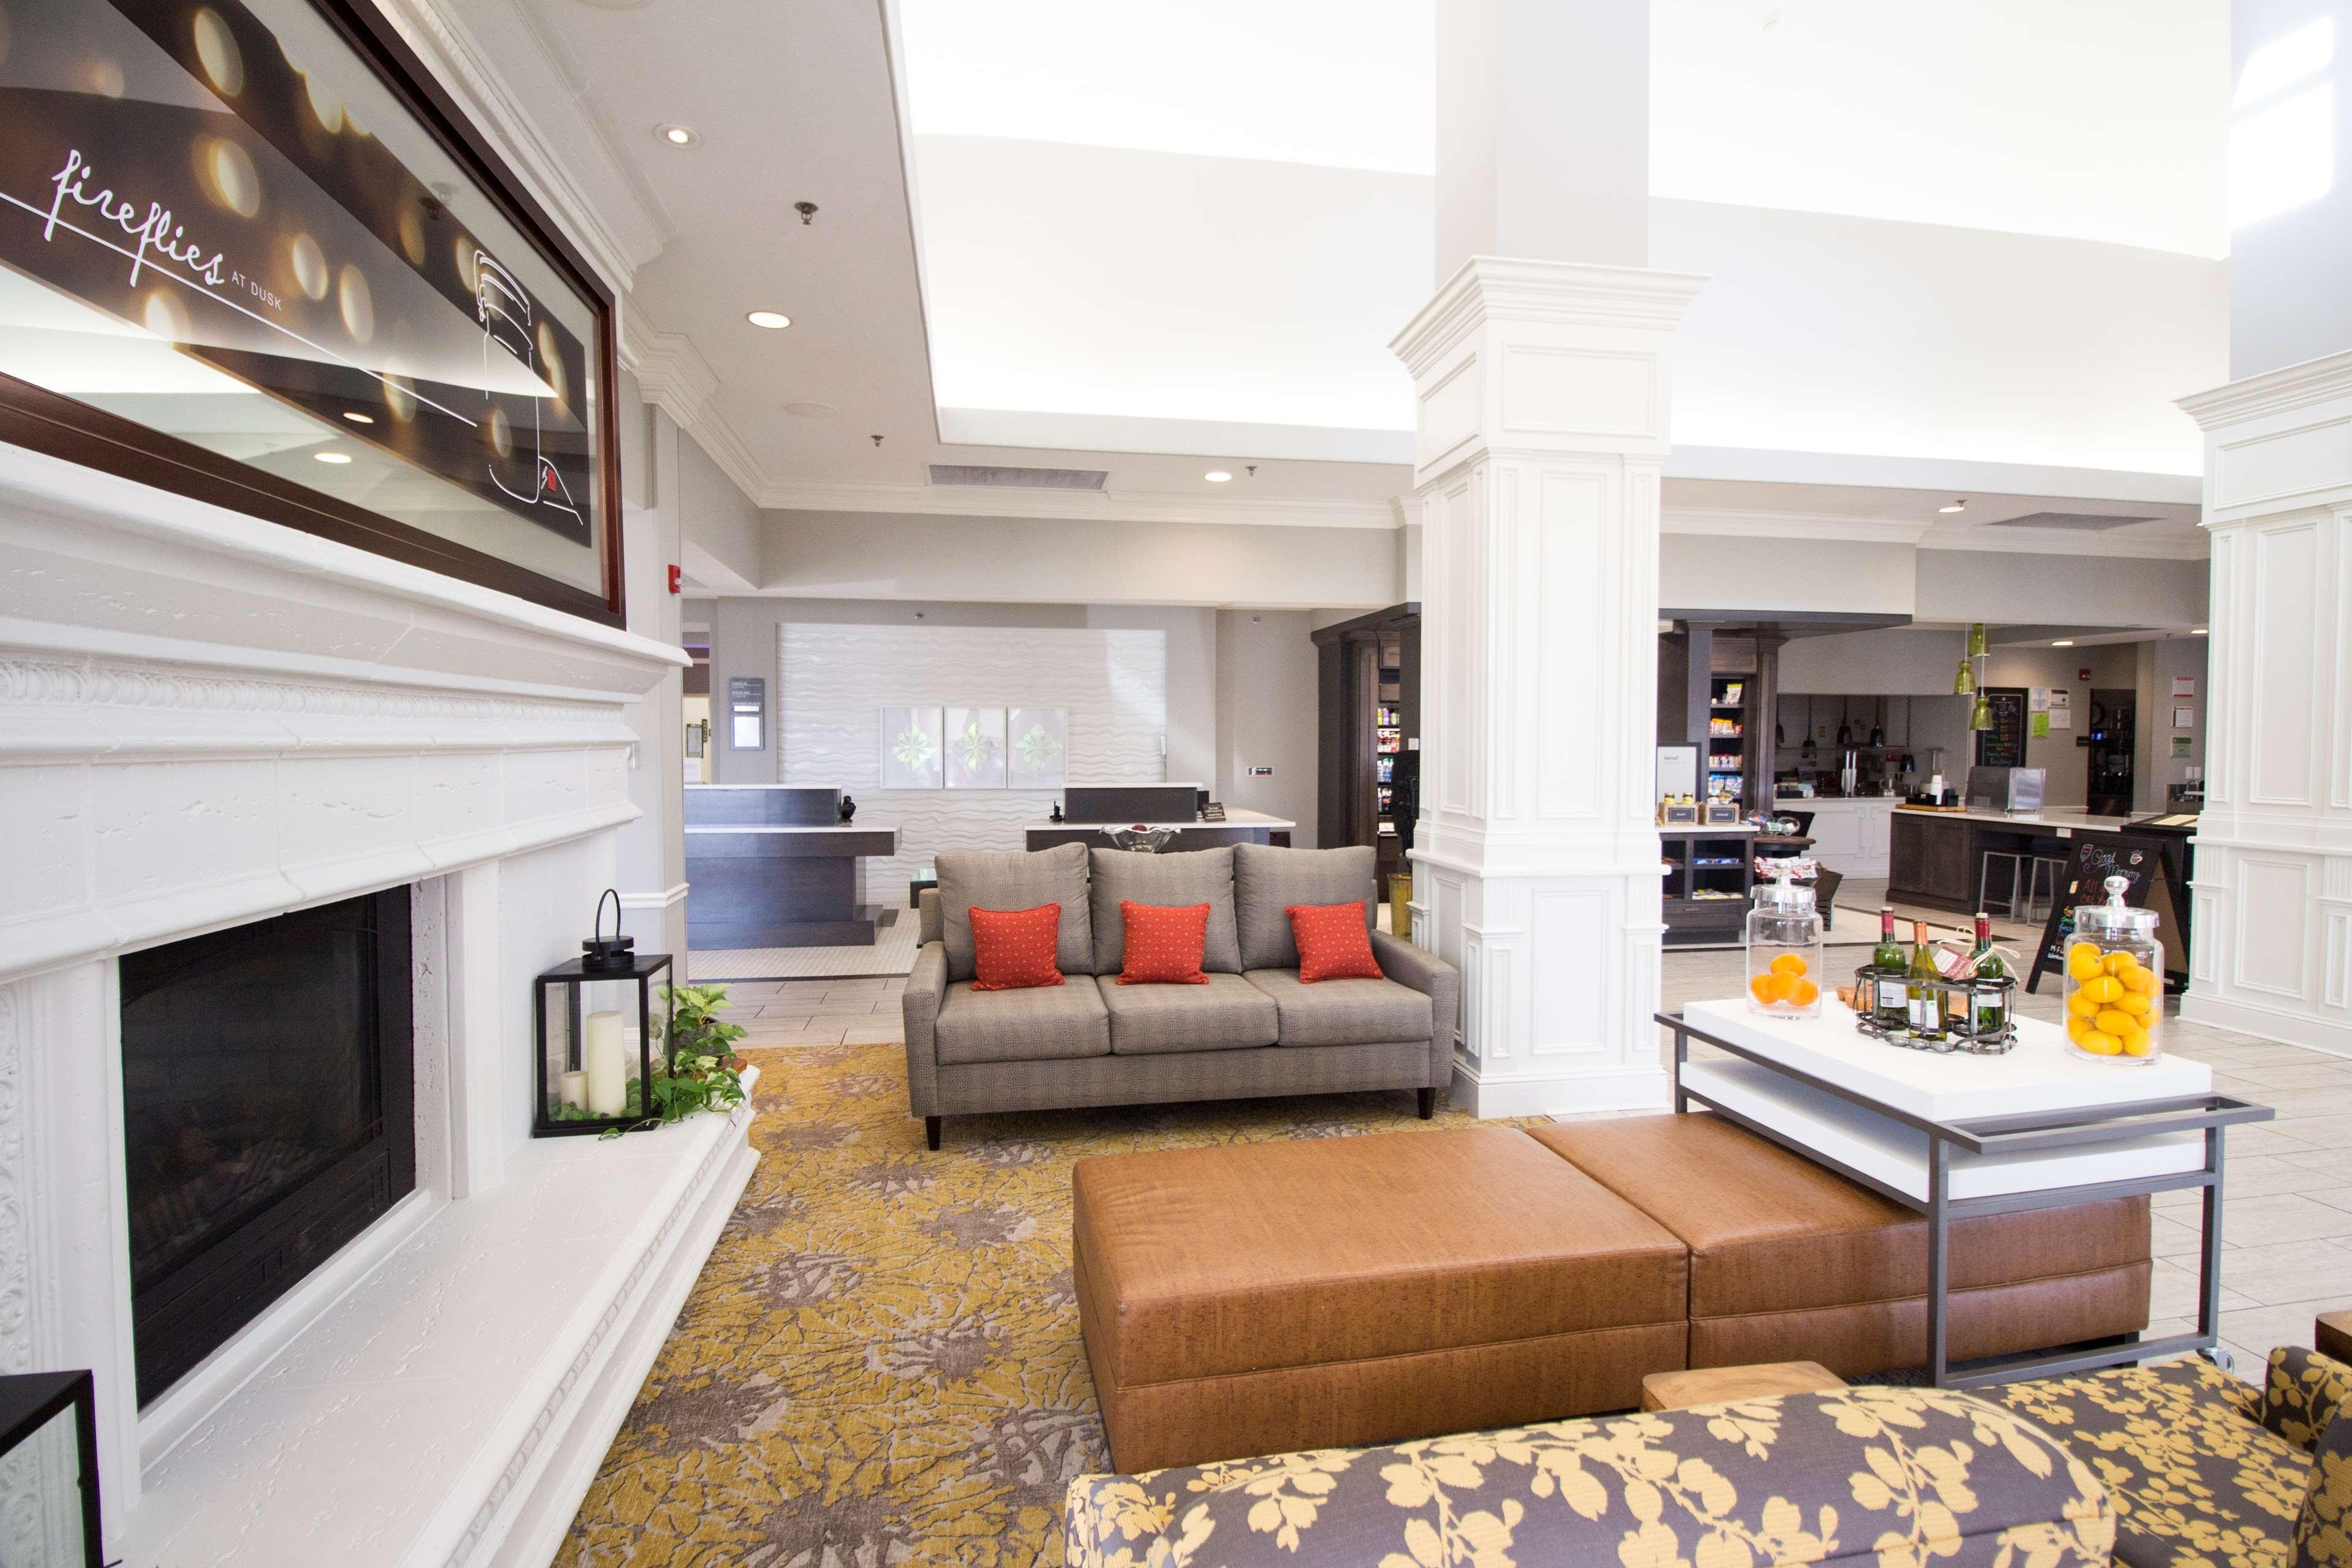 Hilton Garden Inn Champaign/ Urbana image 0